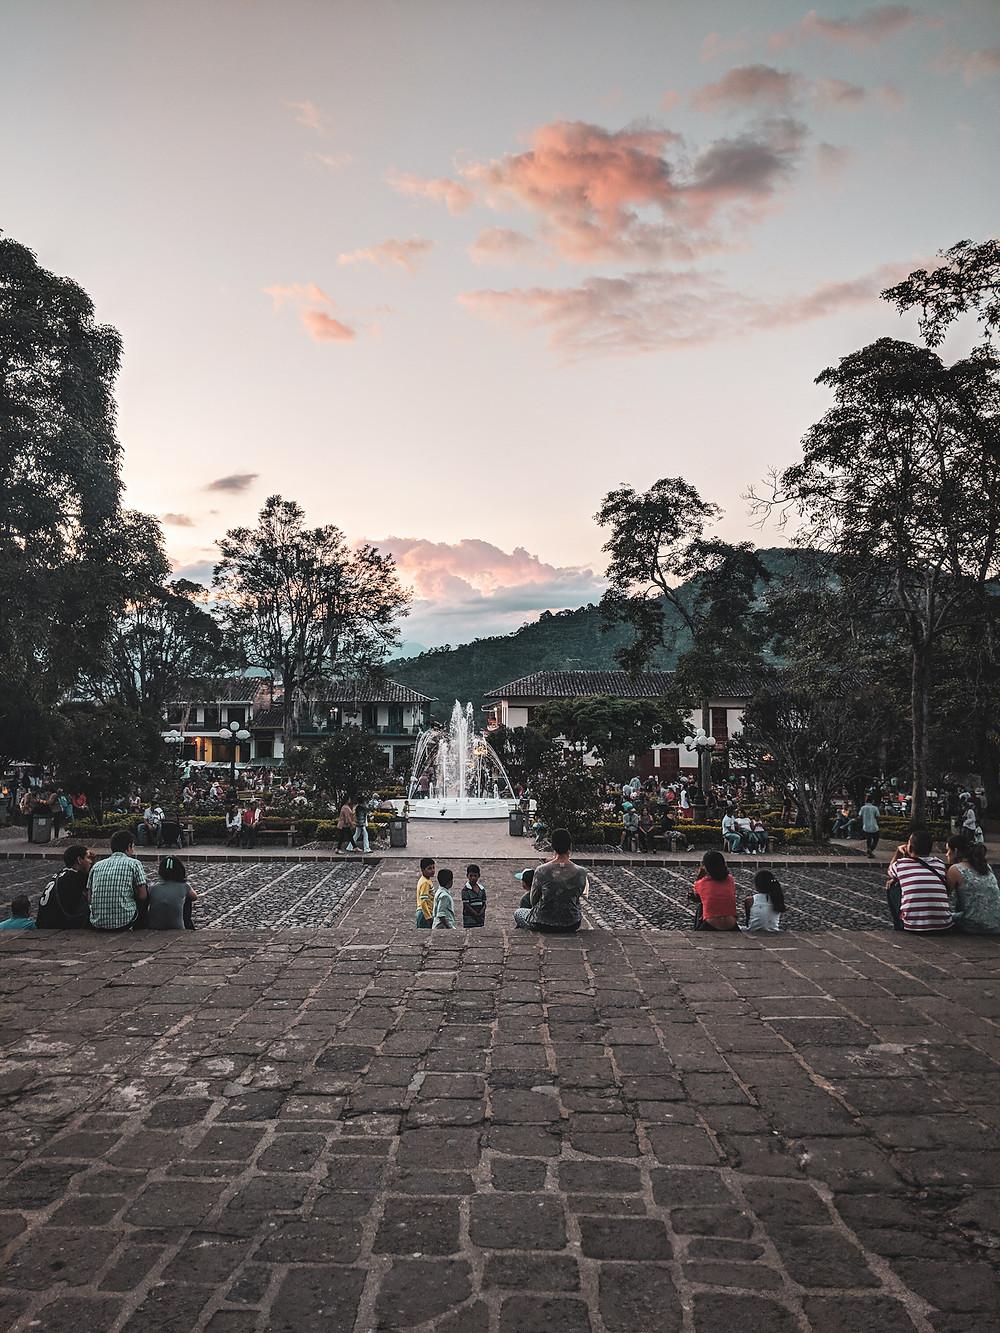 Main square in Jardin, Colombia.